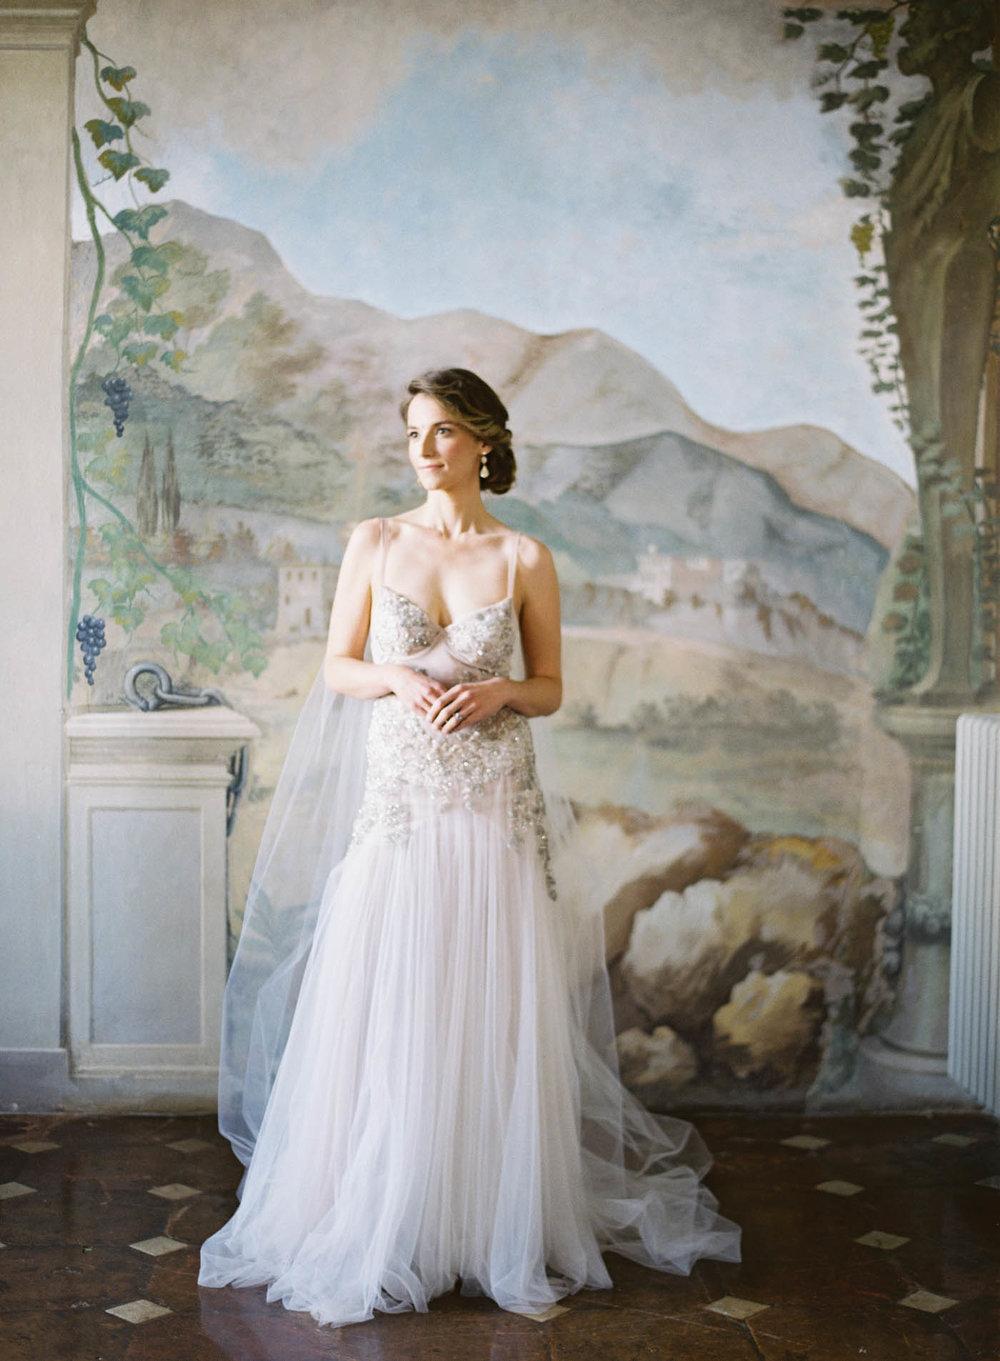 Villa_Cetinale_Wedding-14-Jen_Huang-ElanJacob-154-Jen_Huang-007325-R1-012.jpg